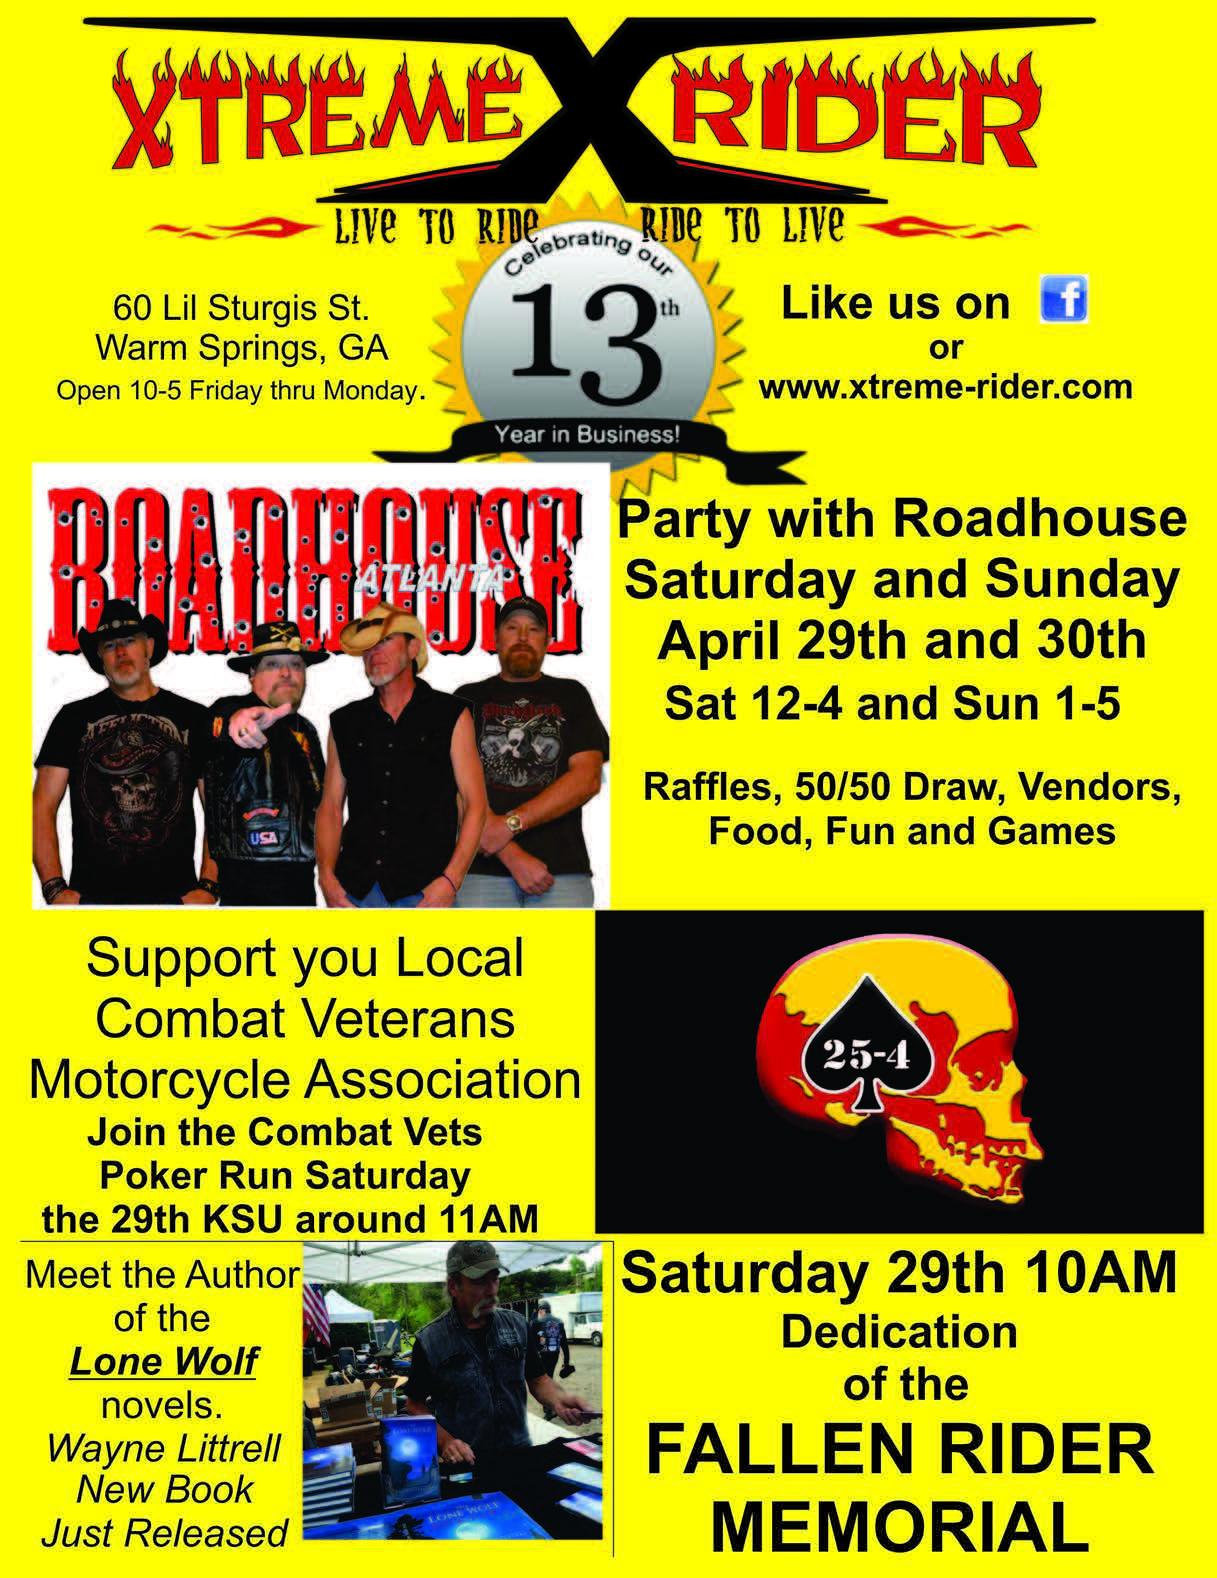 Xtreme Rider Anniversary Celebration